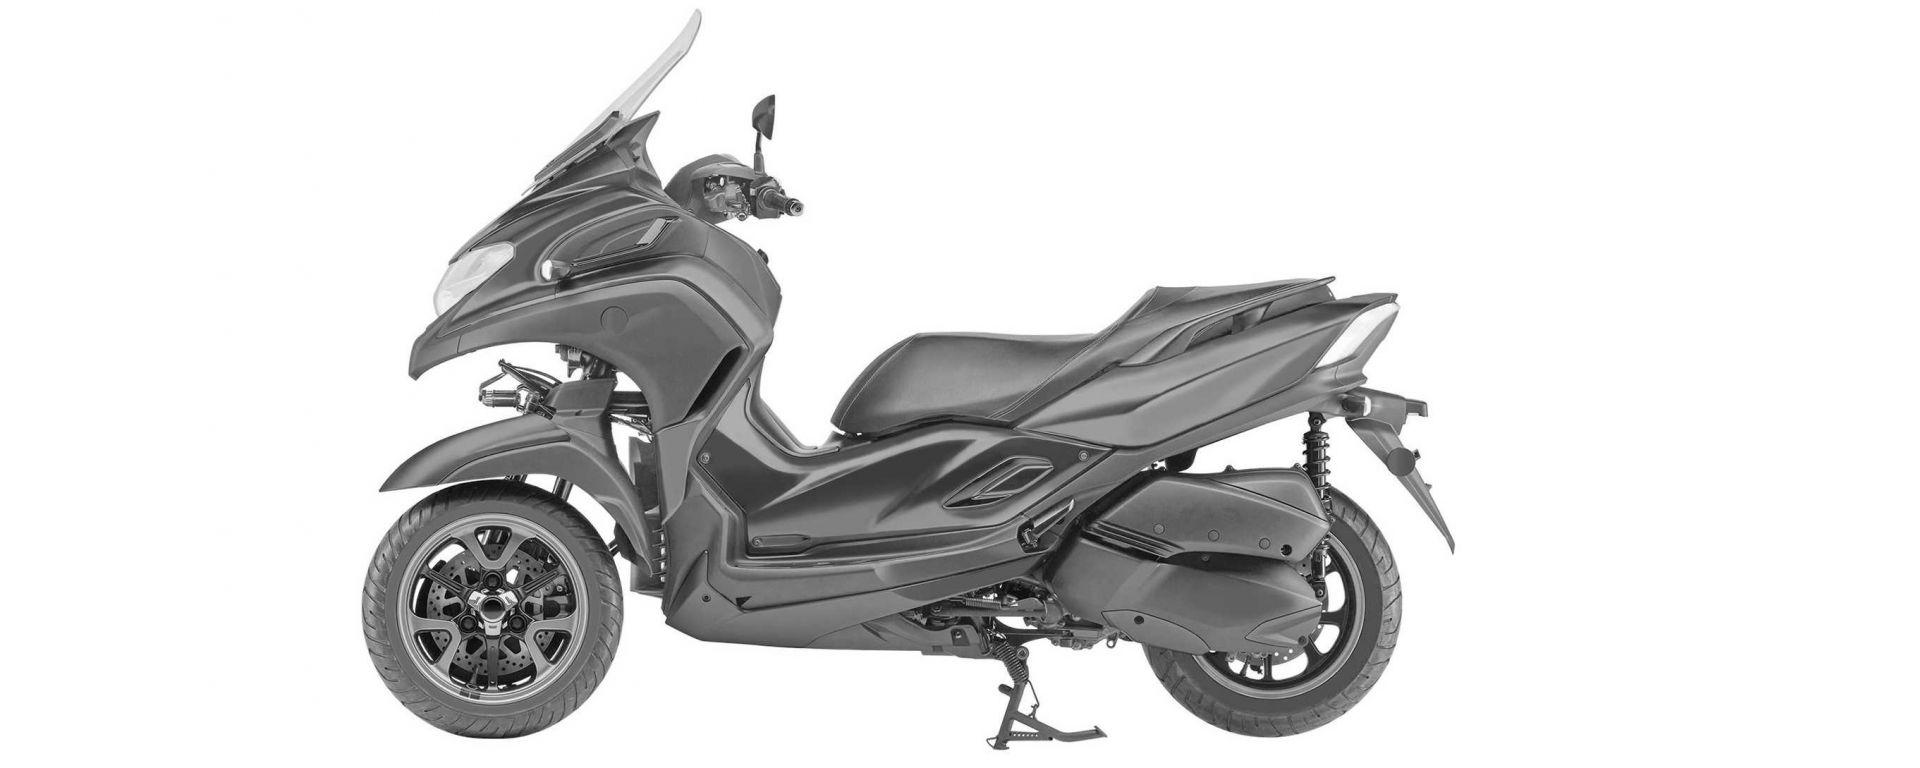 Nuovo Yamaha Tricity 300: potrebbe essere così